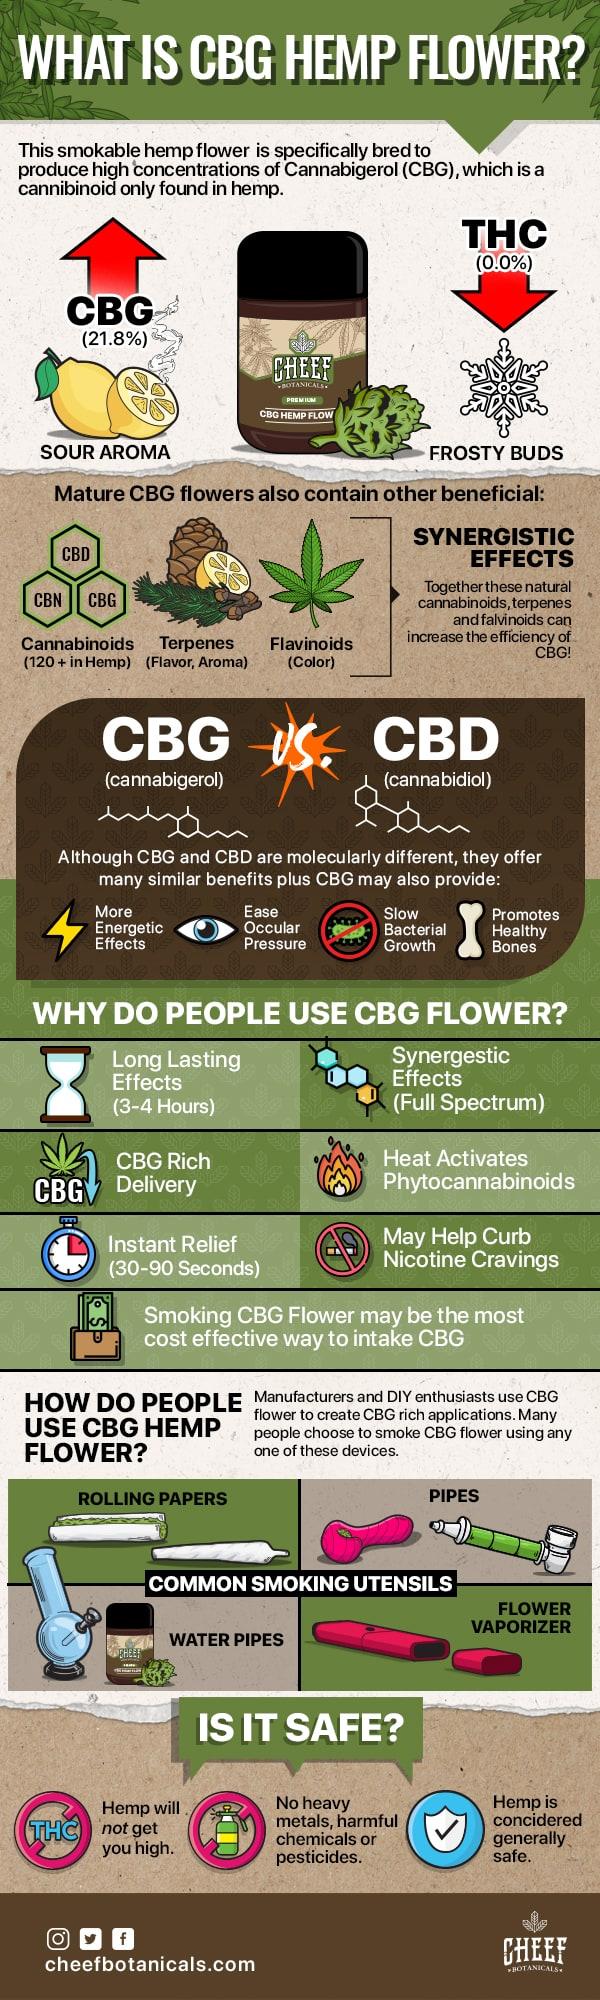 What is CBG Flower?